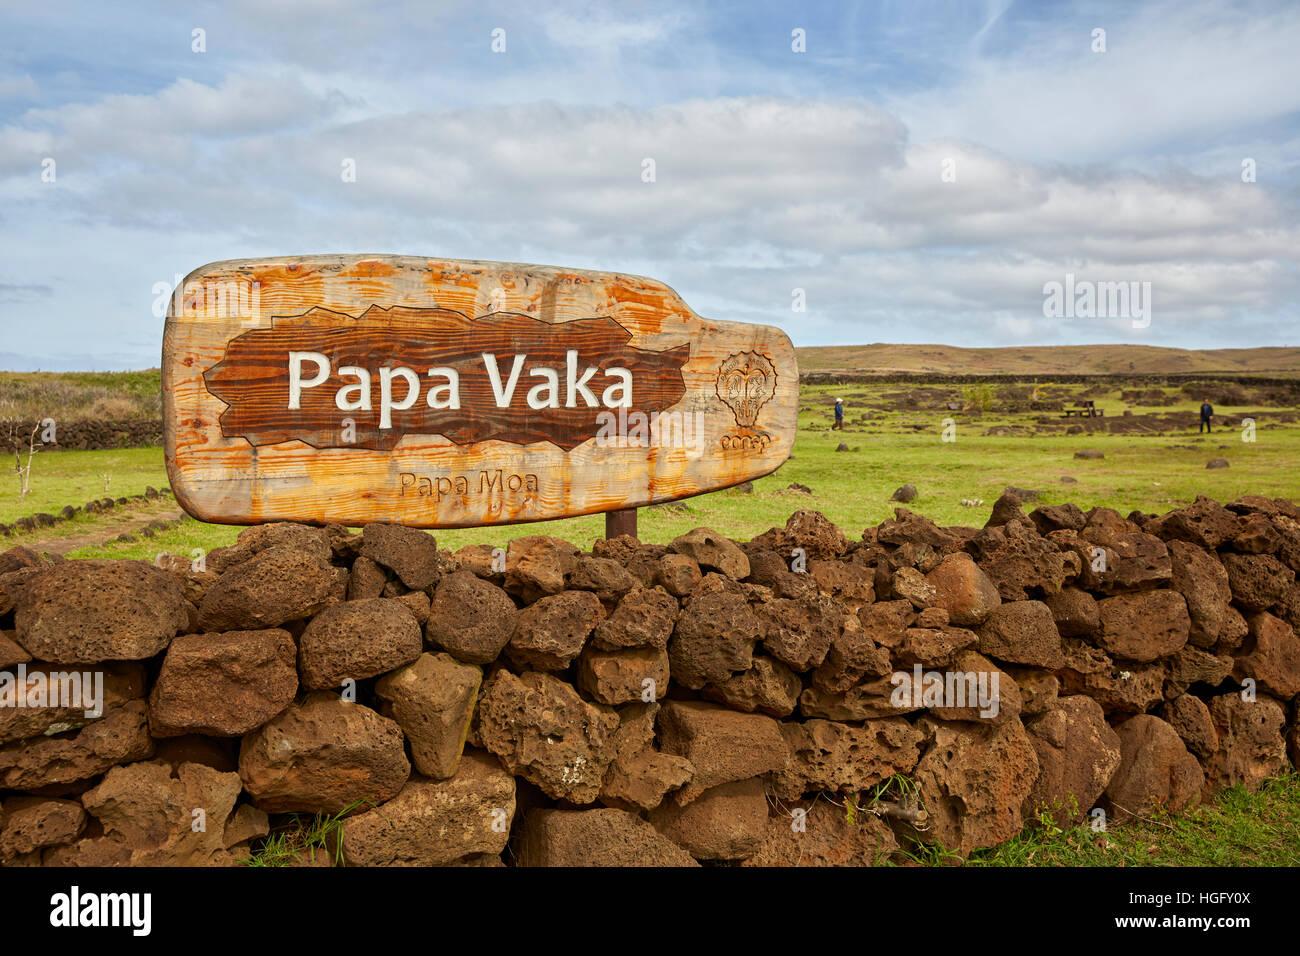 Papa Vaka sign, Easter Island, Chile - Stock Image